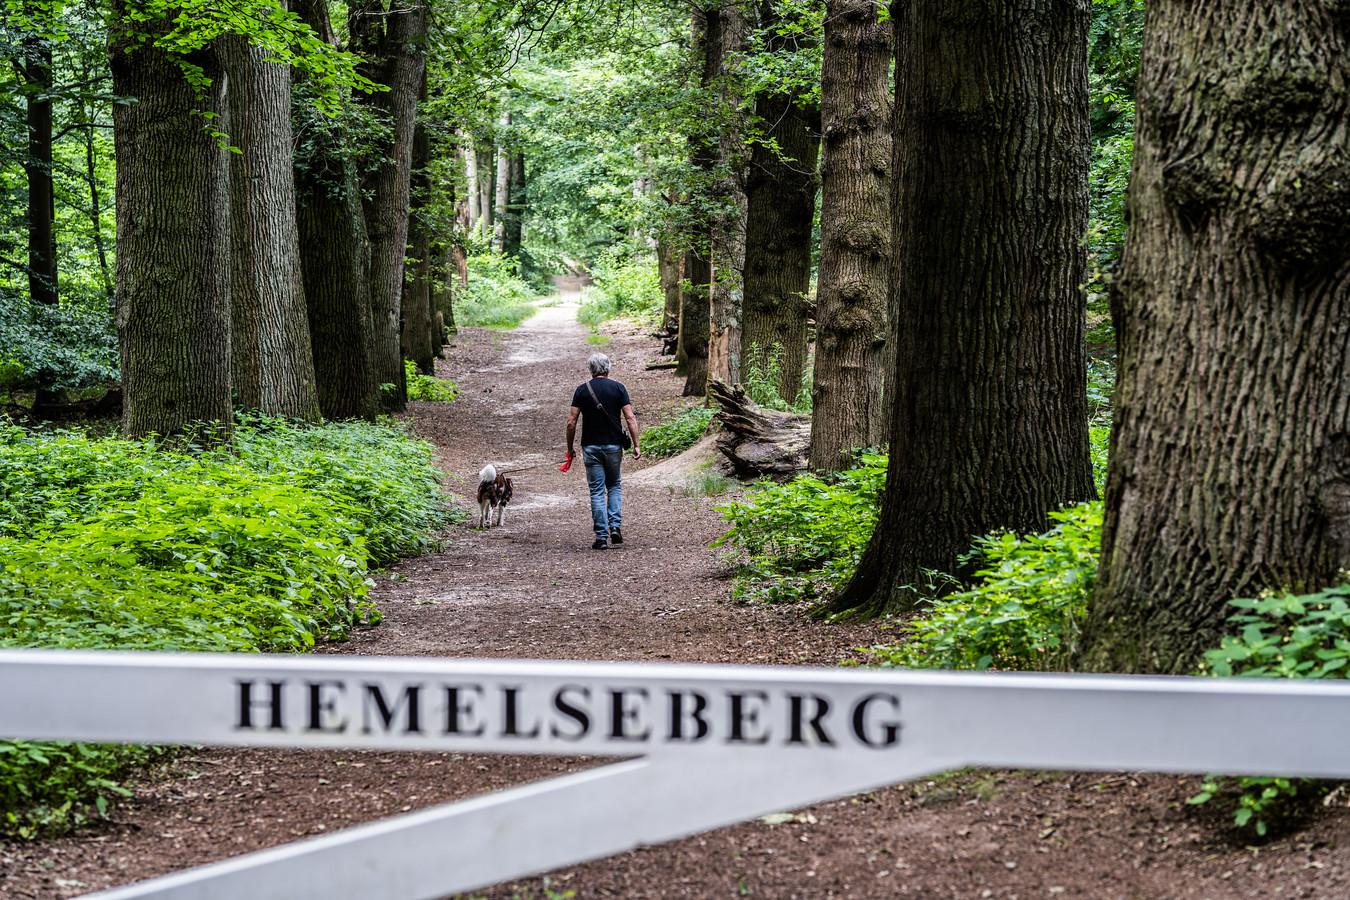 Landgoed De Hemelse Berg in Oosterbeek.